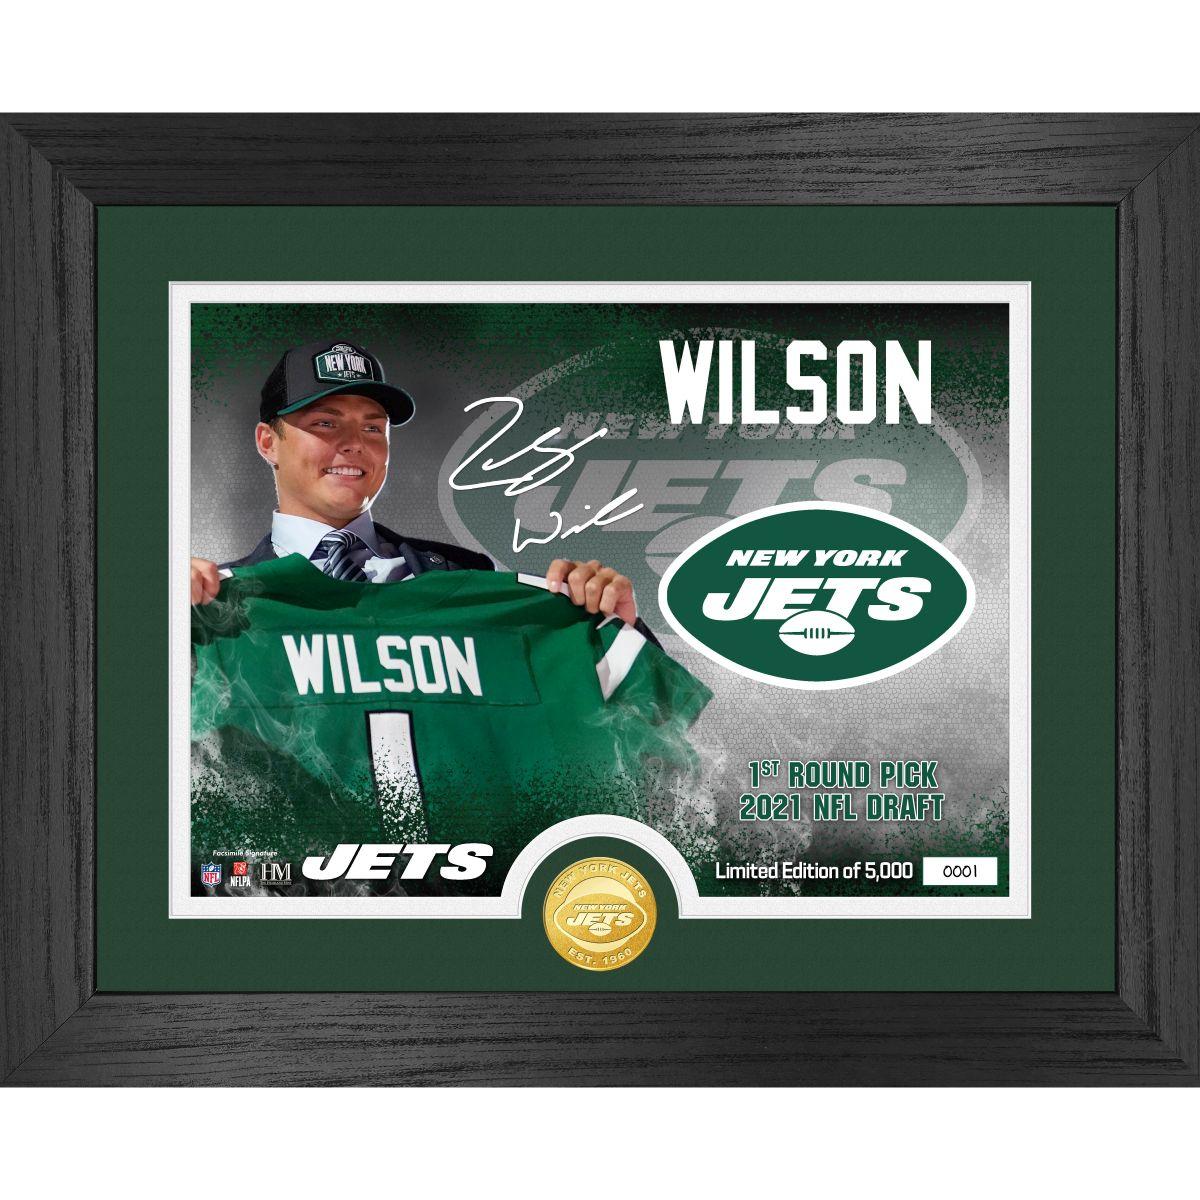 Zach Wilson 2021 NFL Draft Bronze Coin Photo Mint